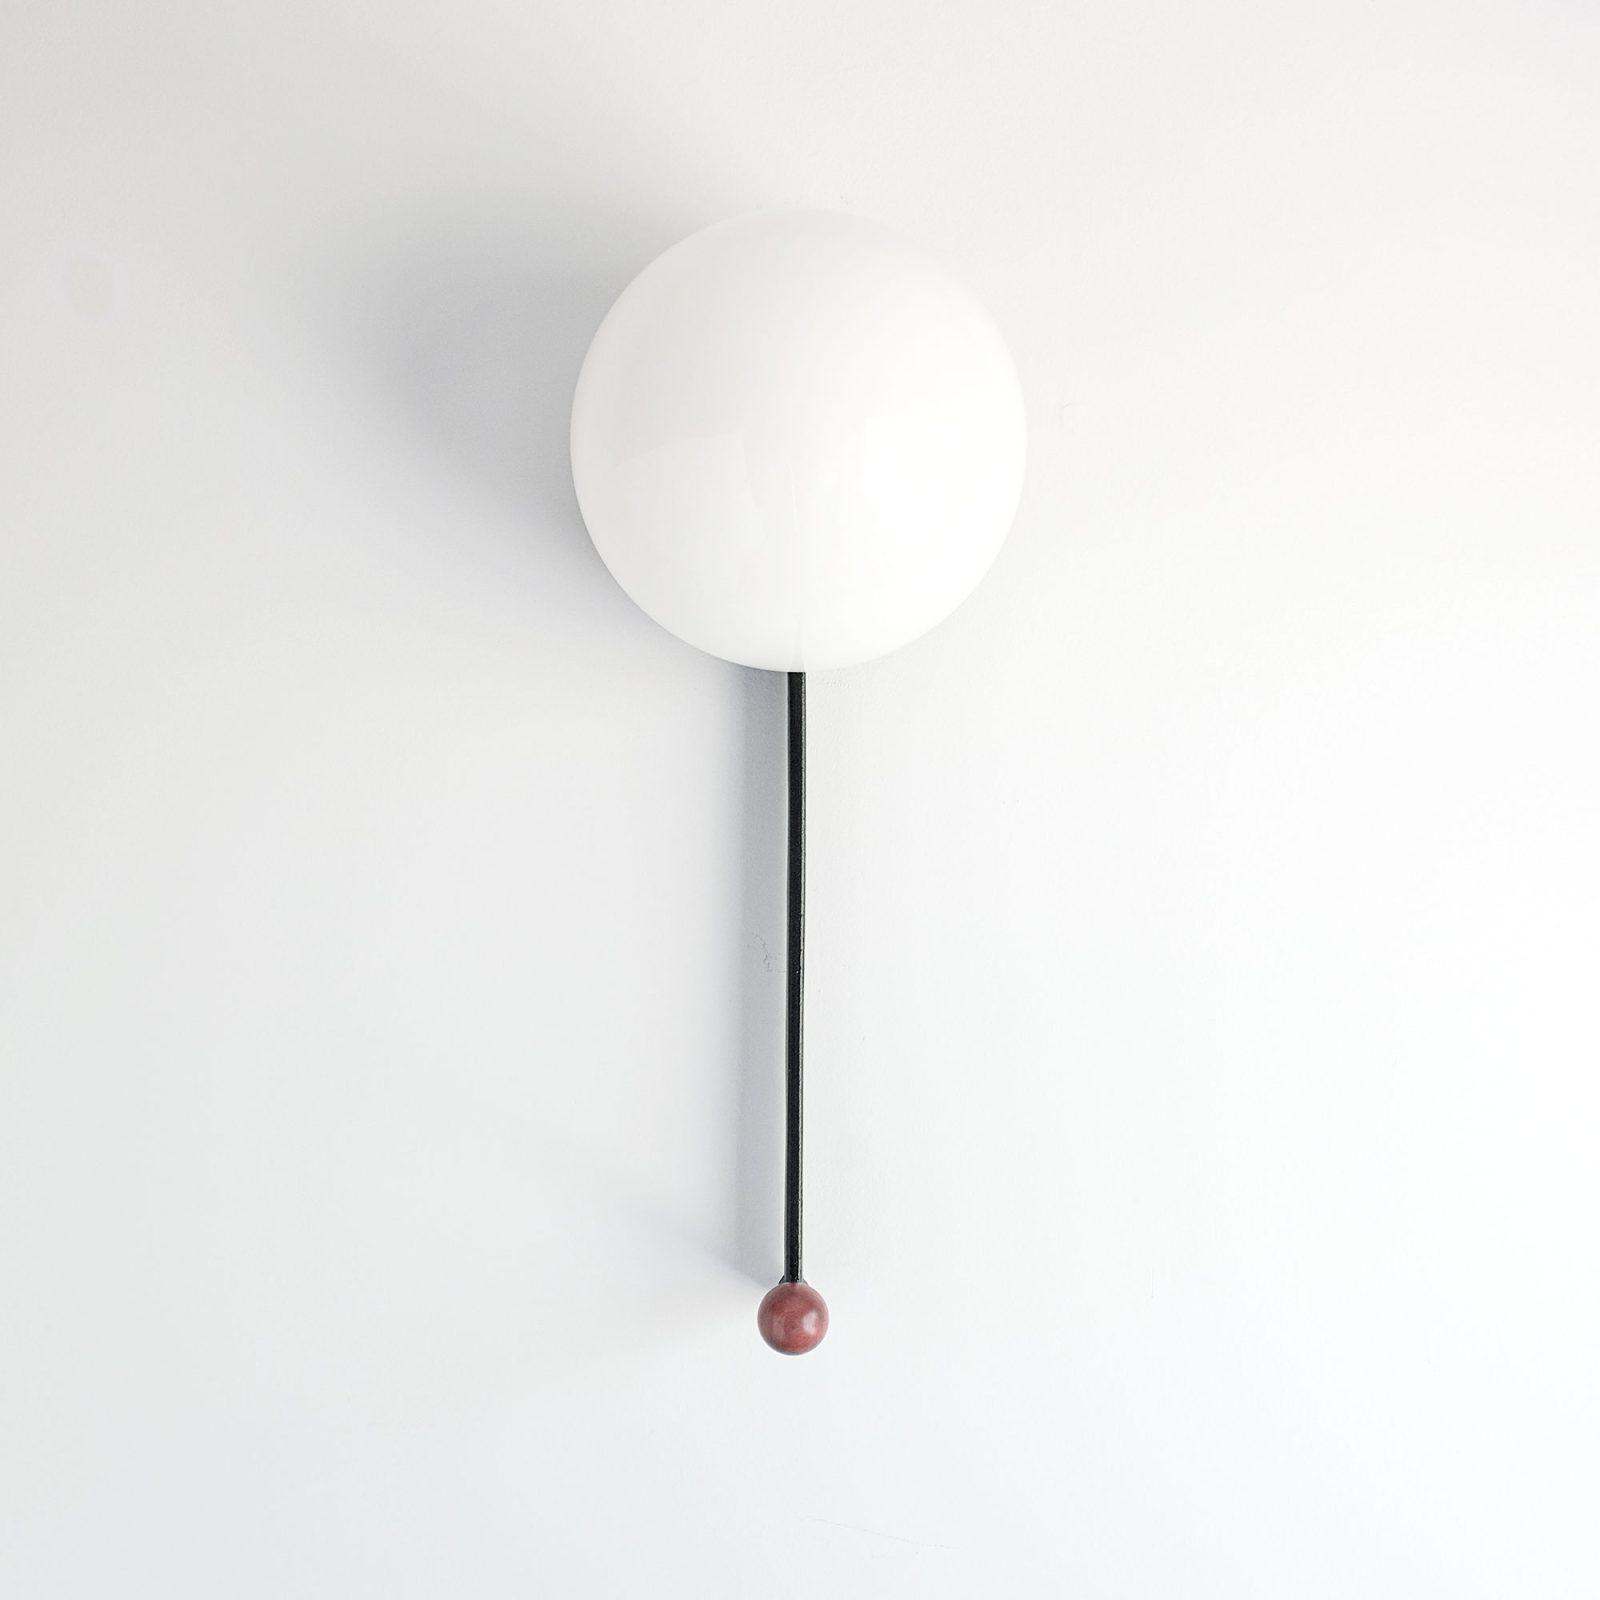 hook-object-interface-2